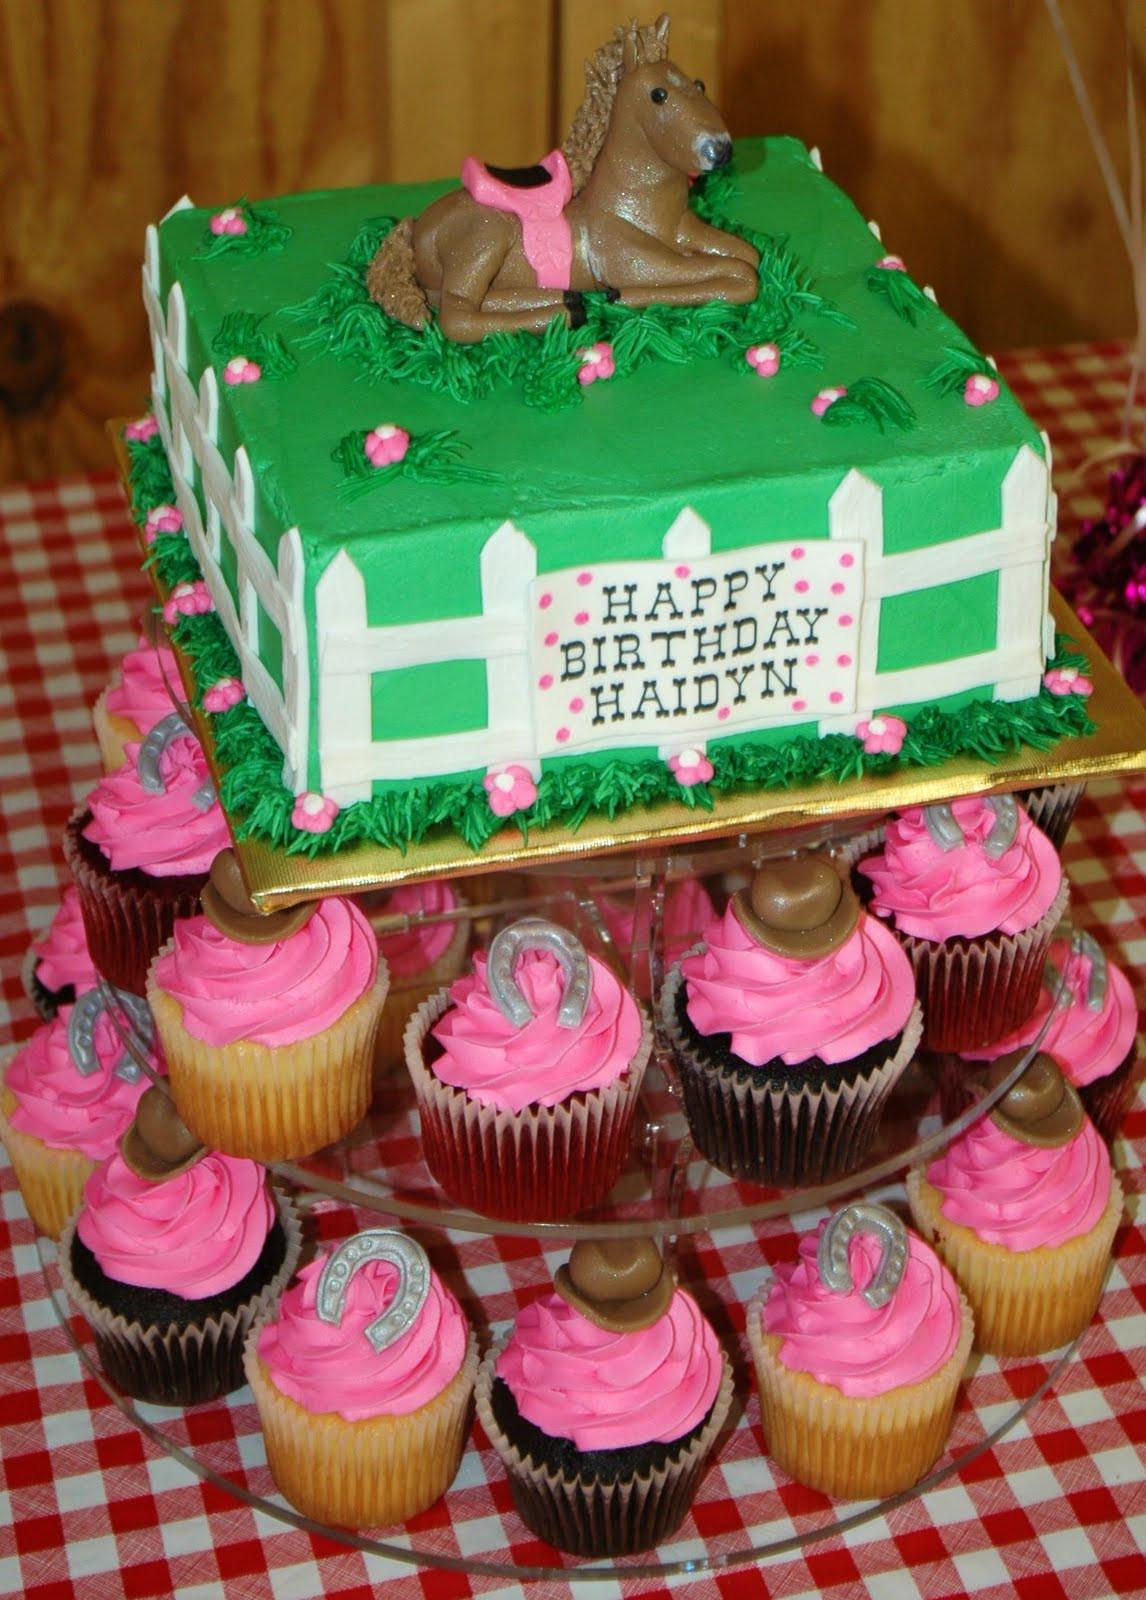 Cake Decorating Ideas For Birthday  Horse Birthday Cakes – Decoration Ideas